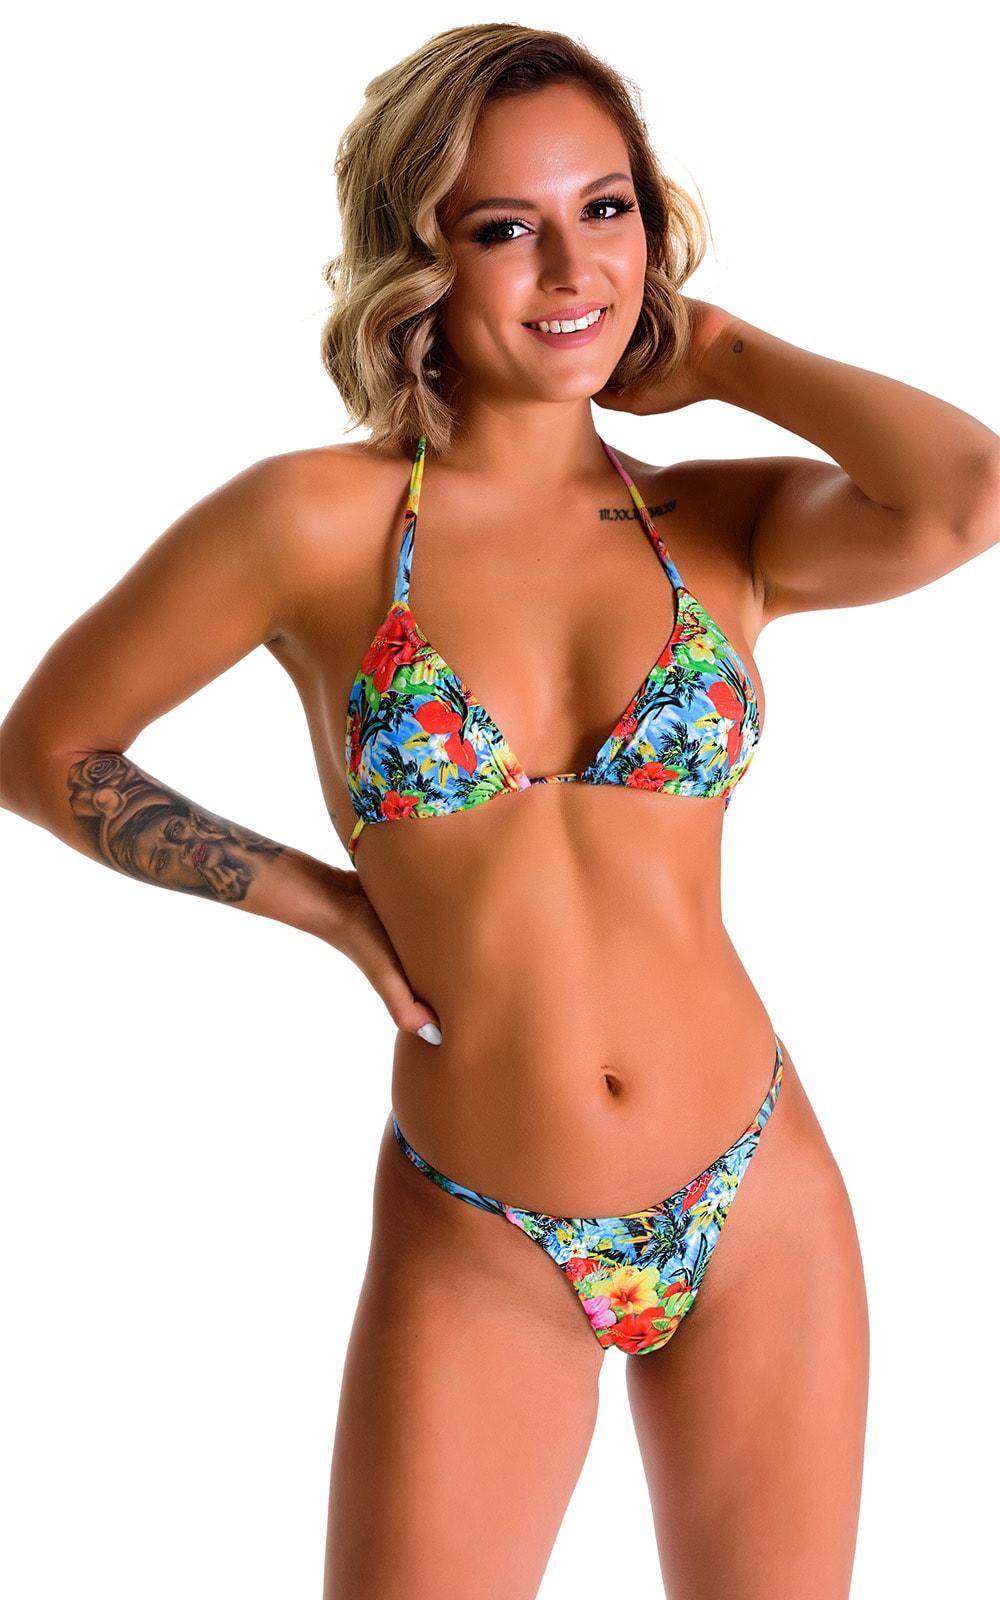 Skinny Side Rio Bikini Bottom in Super ThinSkinz Honolulu 4